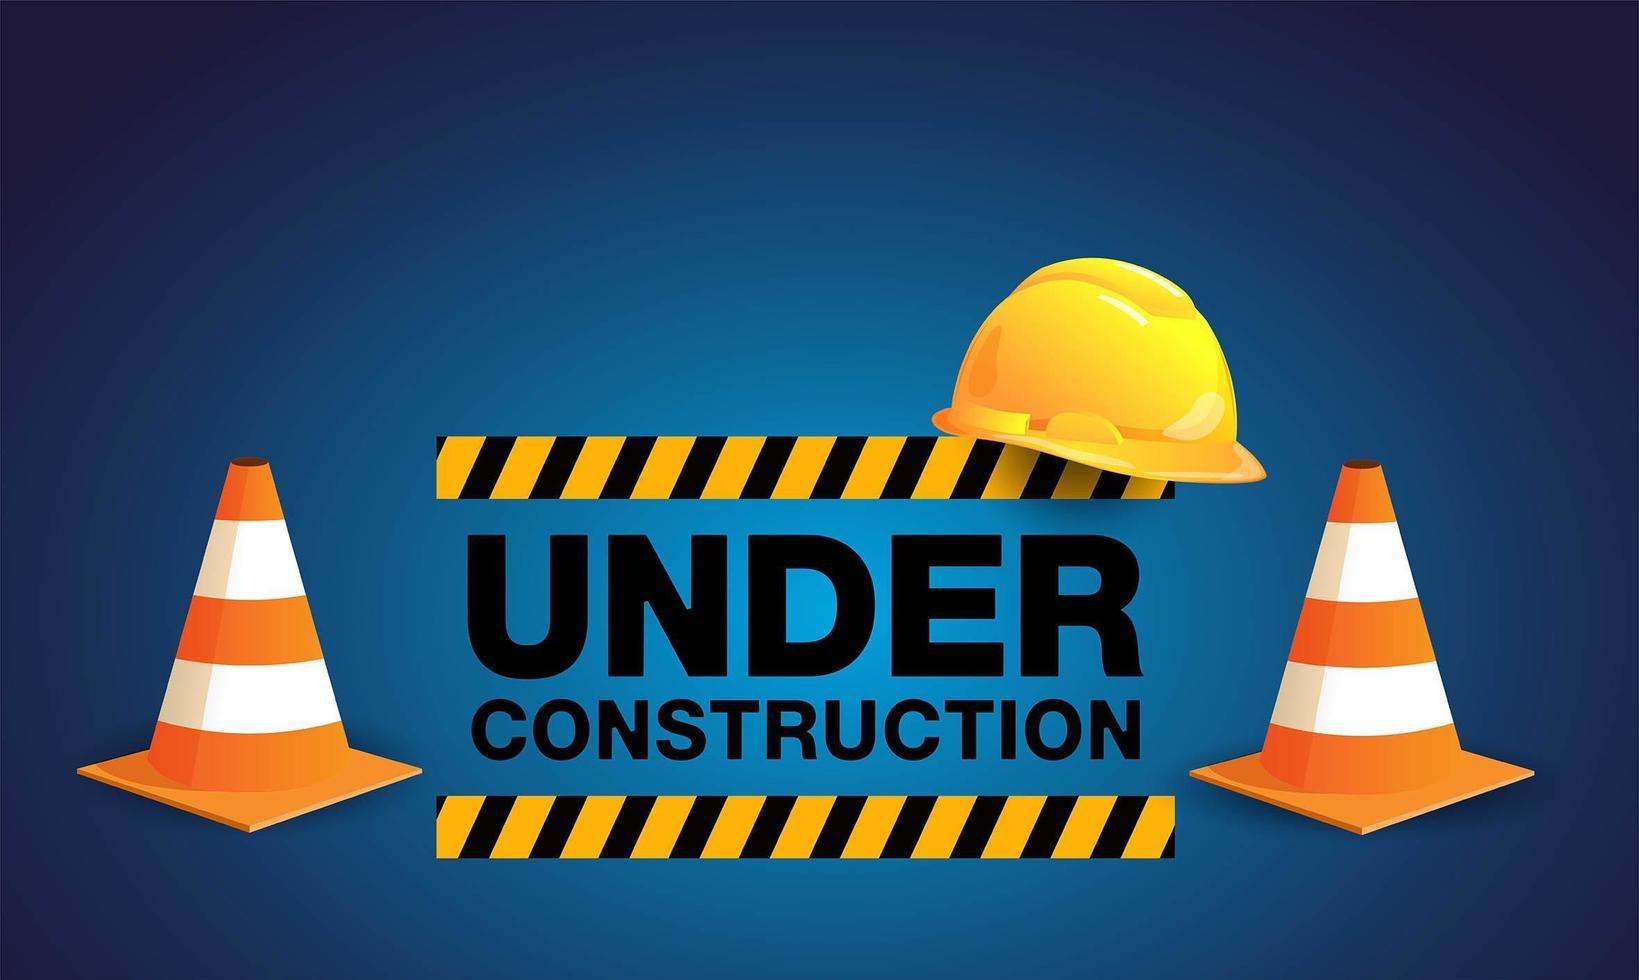 Building under construction site vector